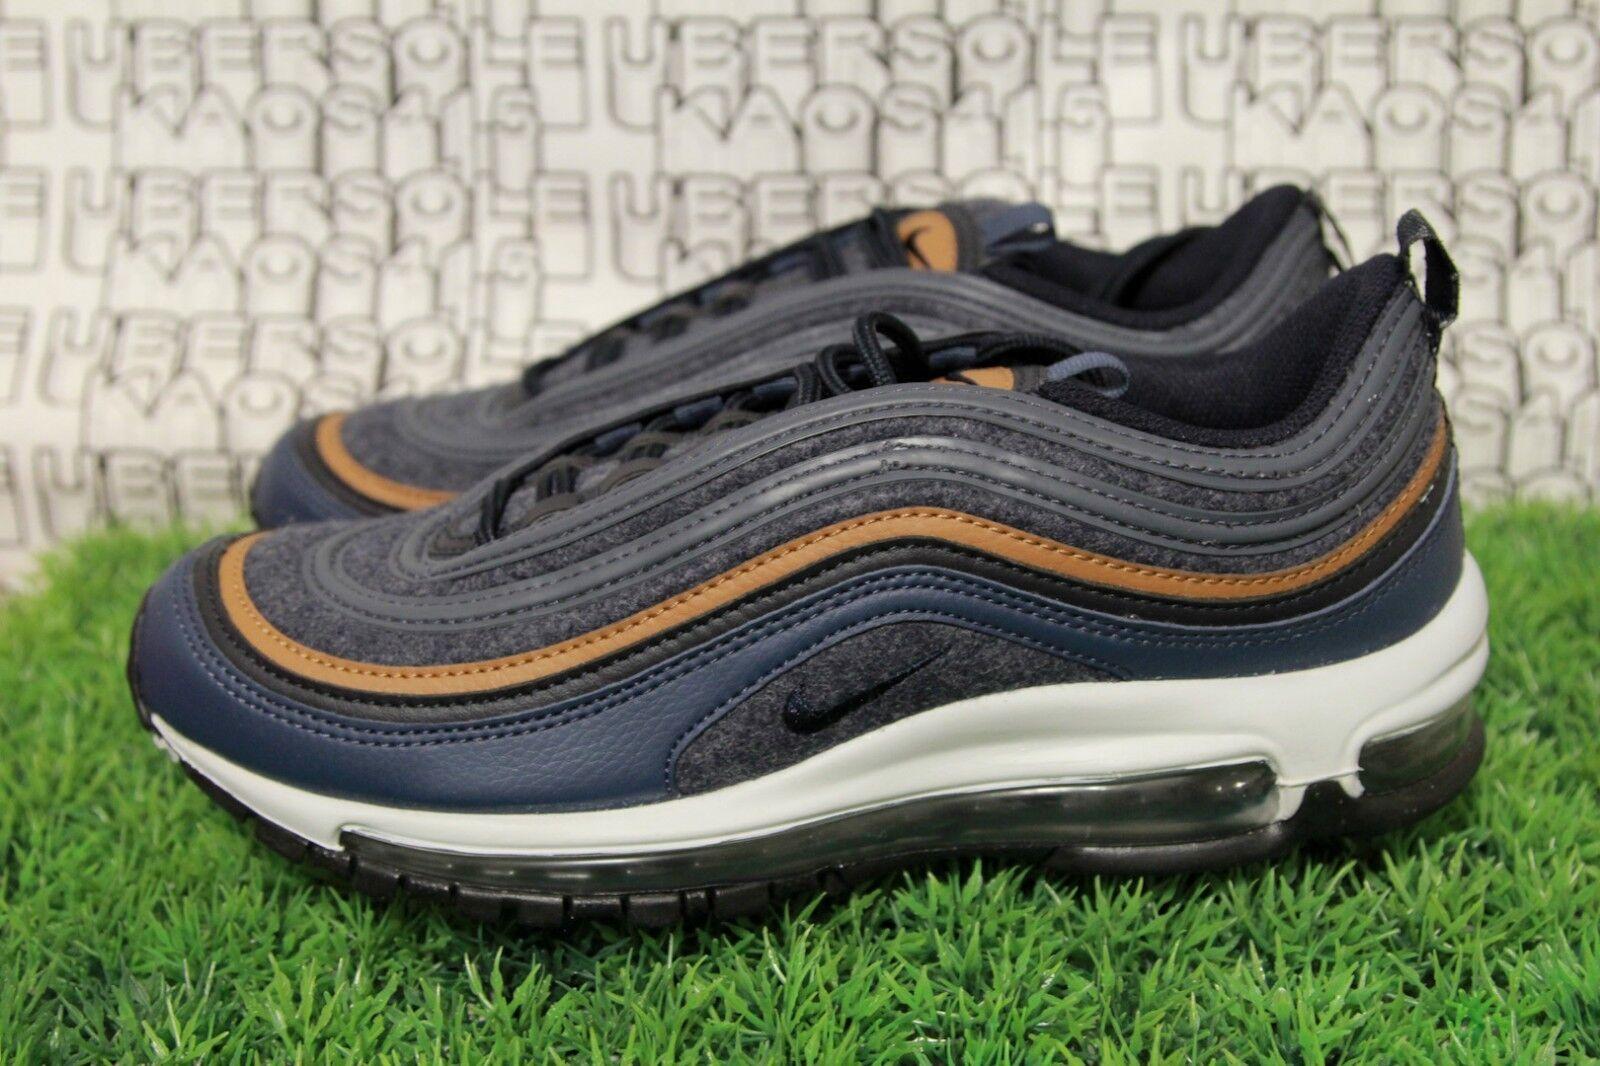 Nike air max 97 premio qs lana blu 312834 / marina / brown 312834 blu 400 biancastro 90 uomini 8,5 d6611d